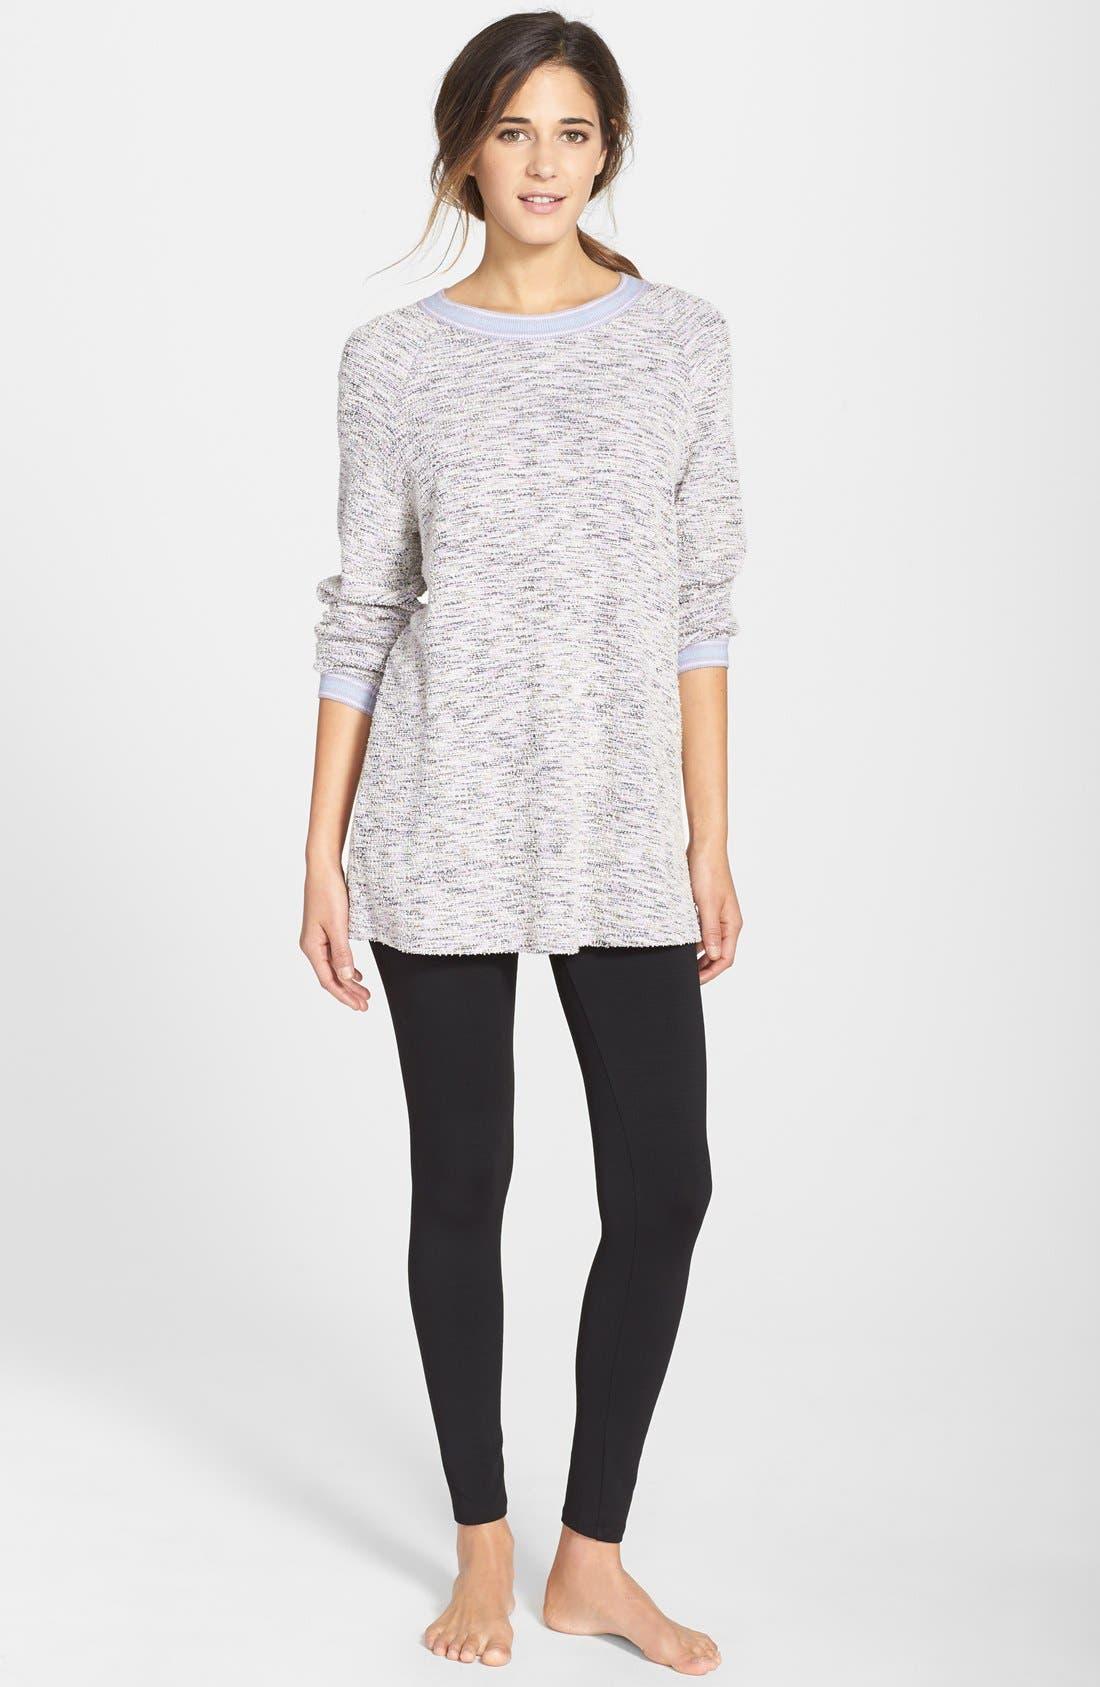 Alternate Image 3  - Only Hearts Oversize Bouclé Knit Sweatshirt